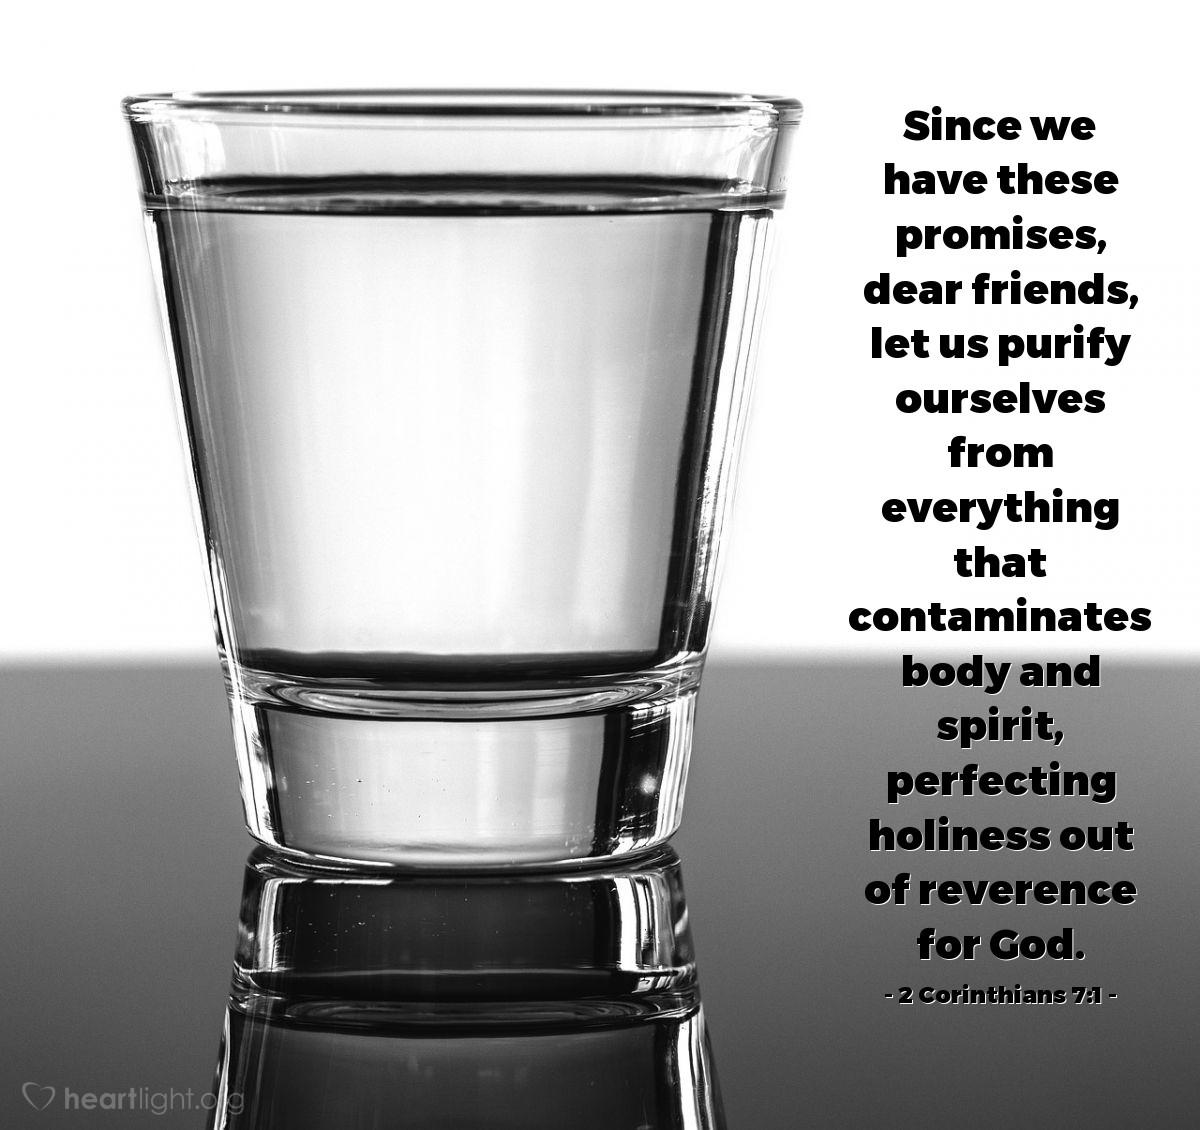 Inspirational illustration of 2 Corinthians 7:1